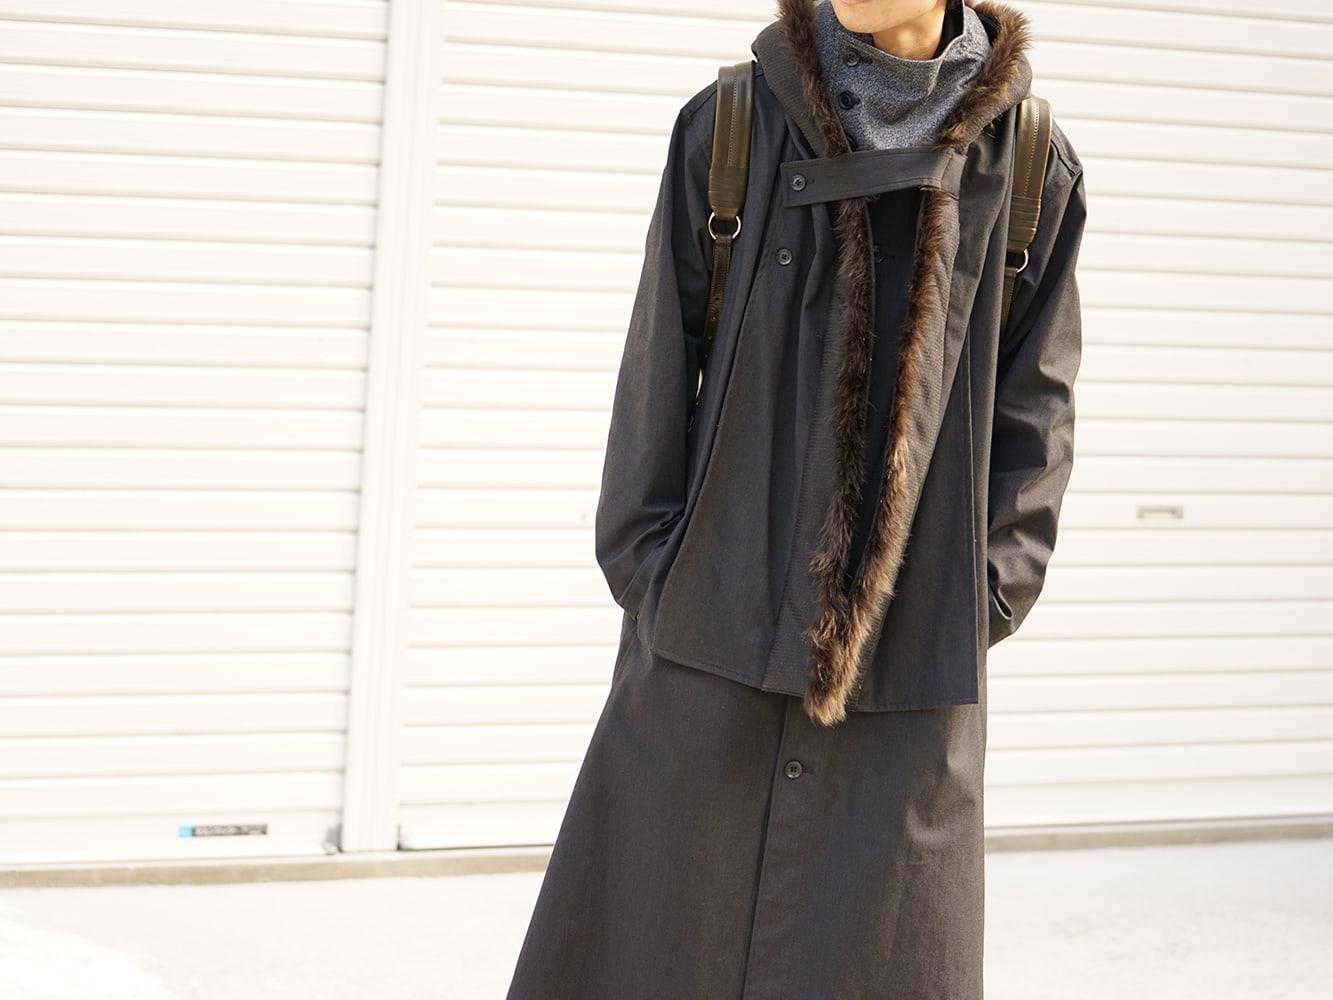 Yohji Yamamoto High-necked leather jacket Style 04